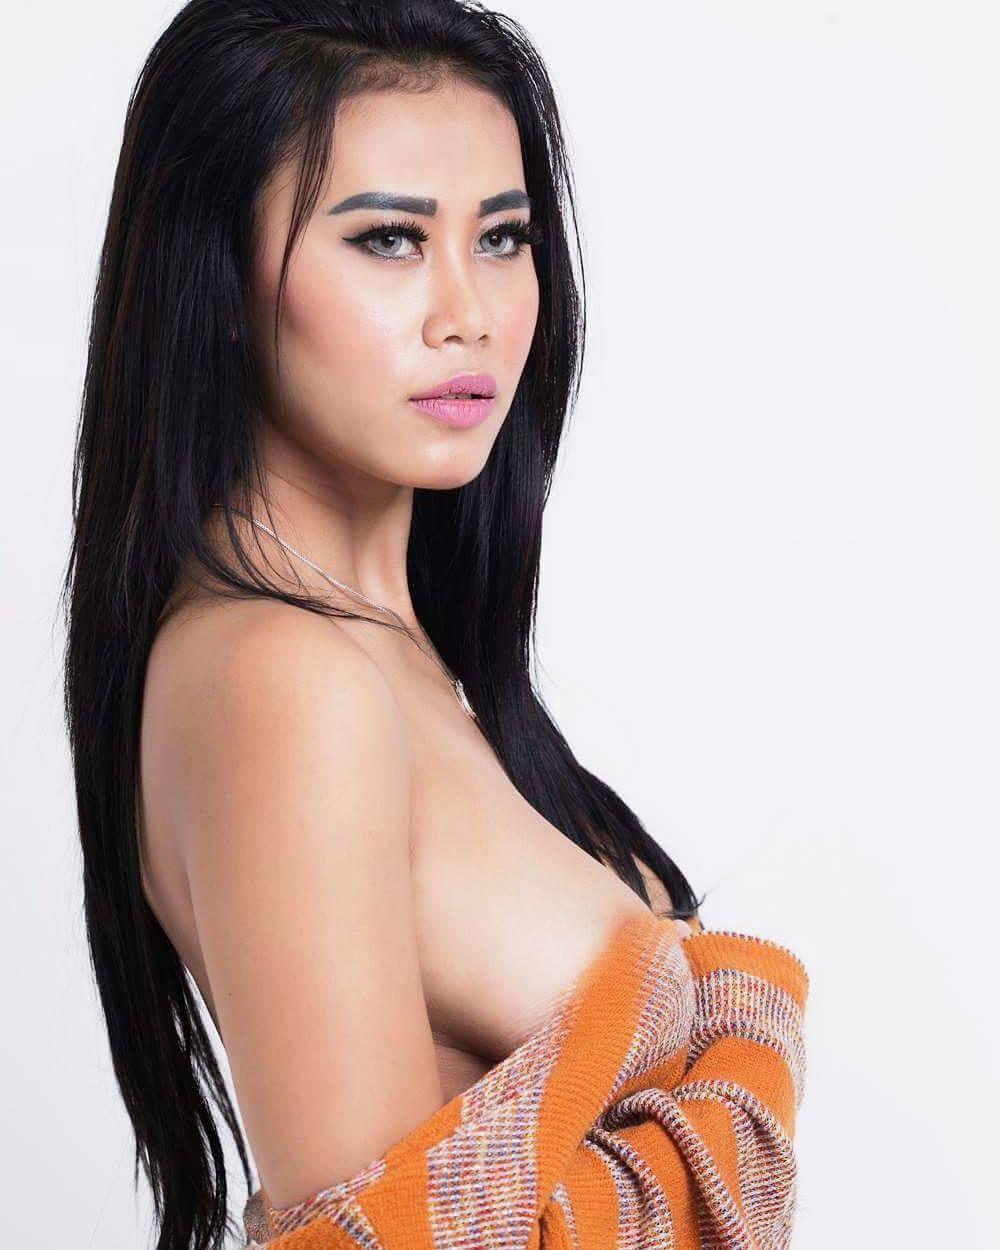 Photographer Fred Zinggl Model Gavriena Astaris Malaysia Kl